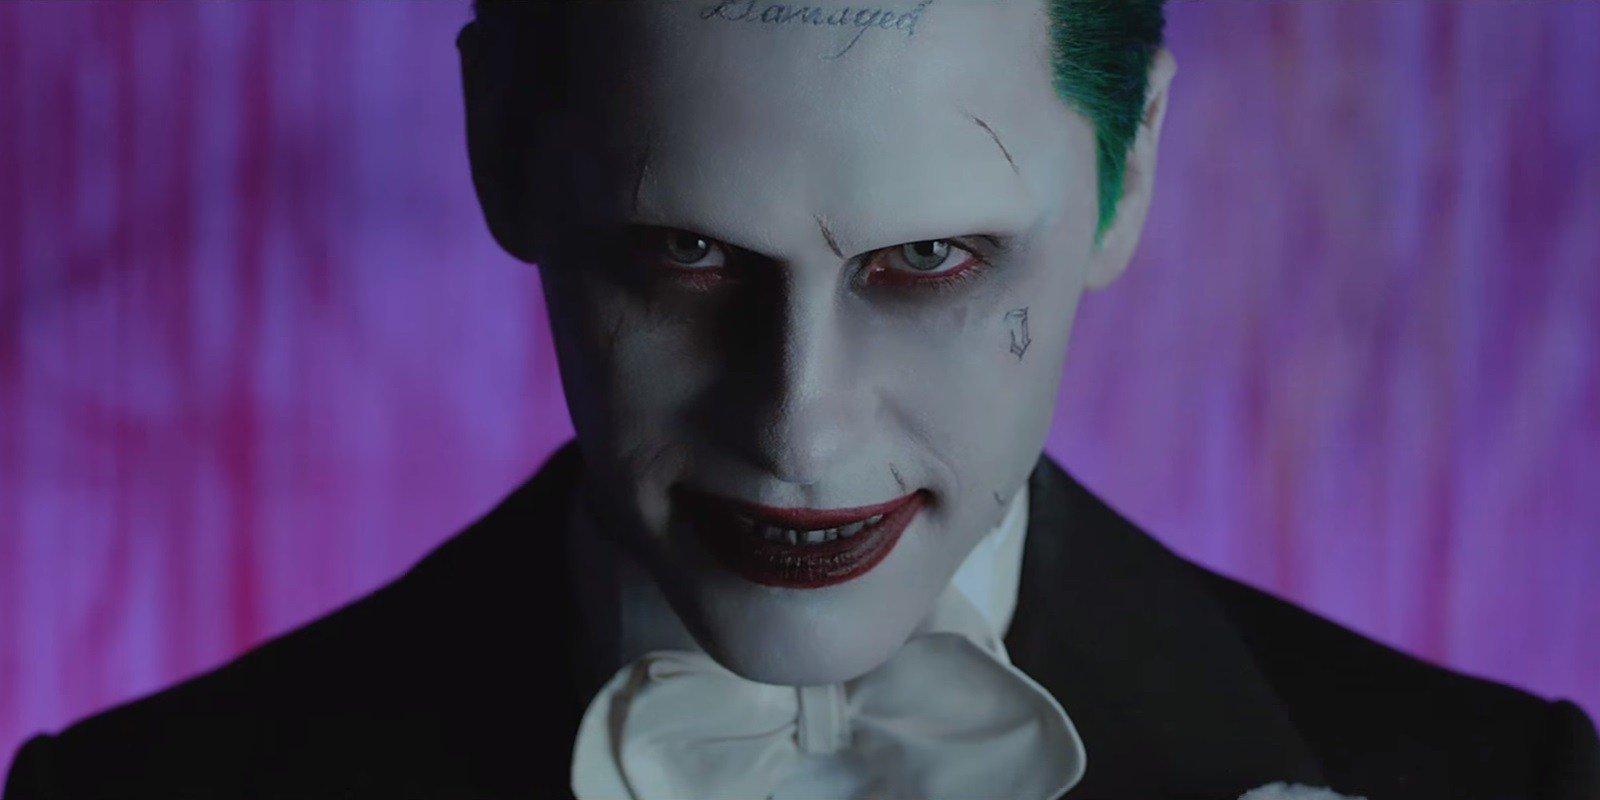 #Joker – il film DC con #JaredLeto è in fase di sviluppo. @WarnerBrosIta https://t.co/jBQGUolpi3 https://t.co/A1vJAtfIc8